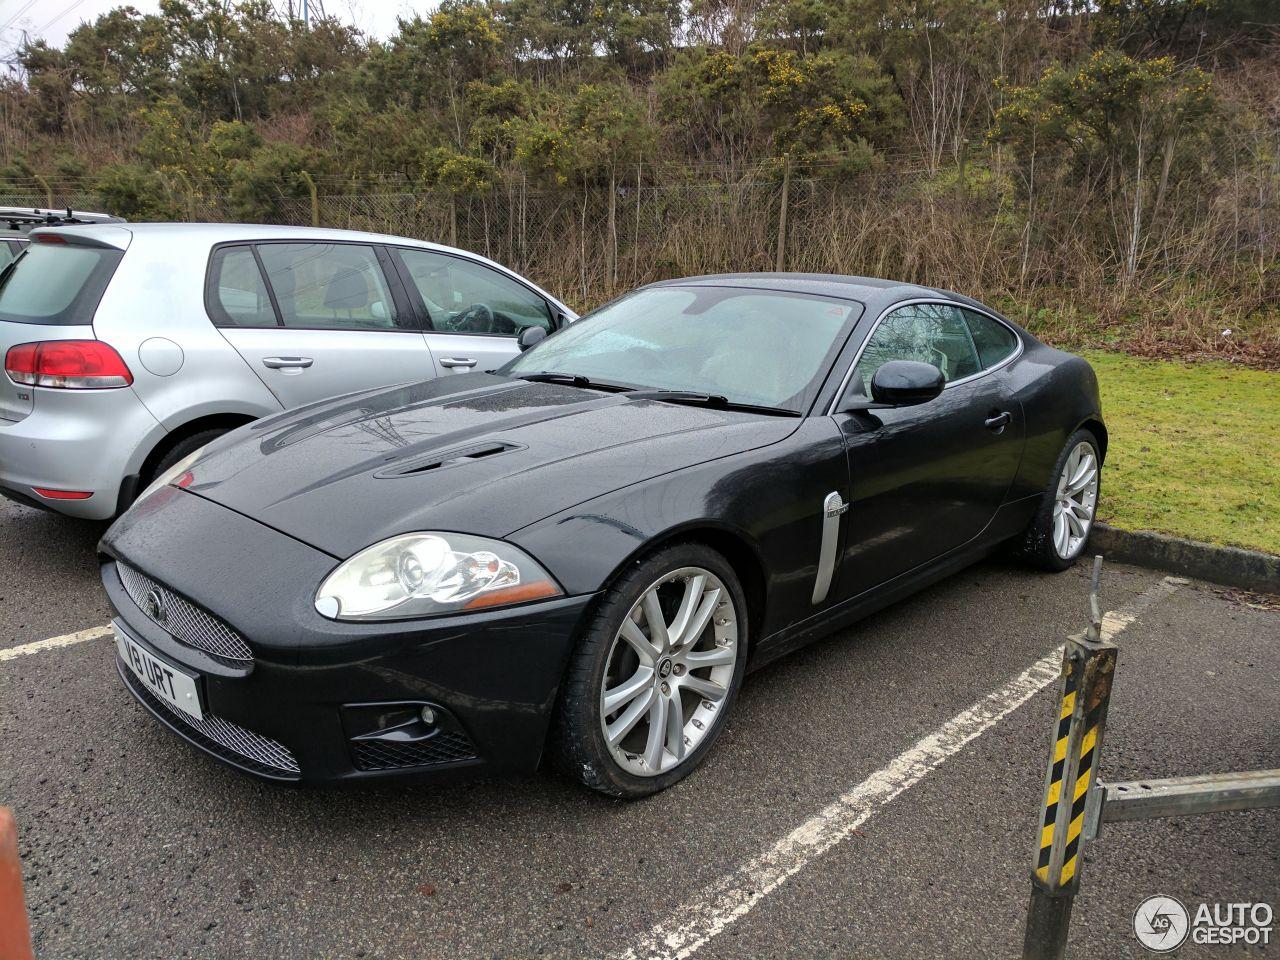 Jaguar XKR 2006 - 12 February 2017 - Autogespot